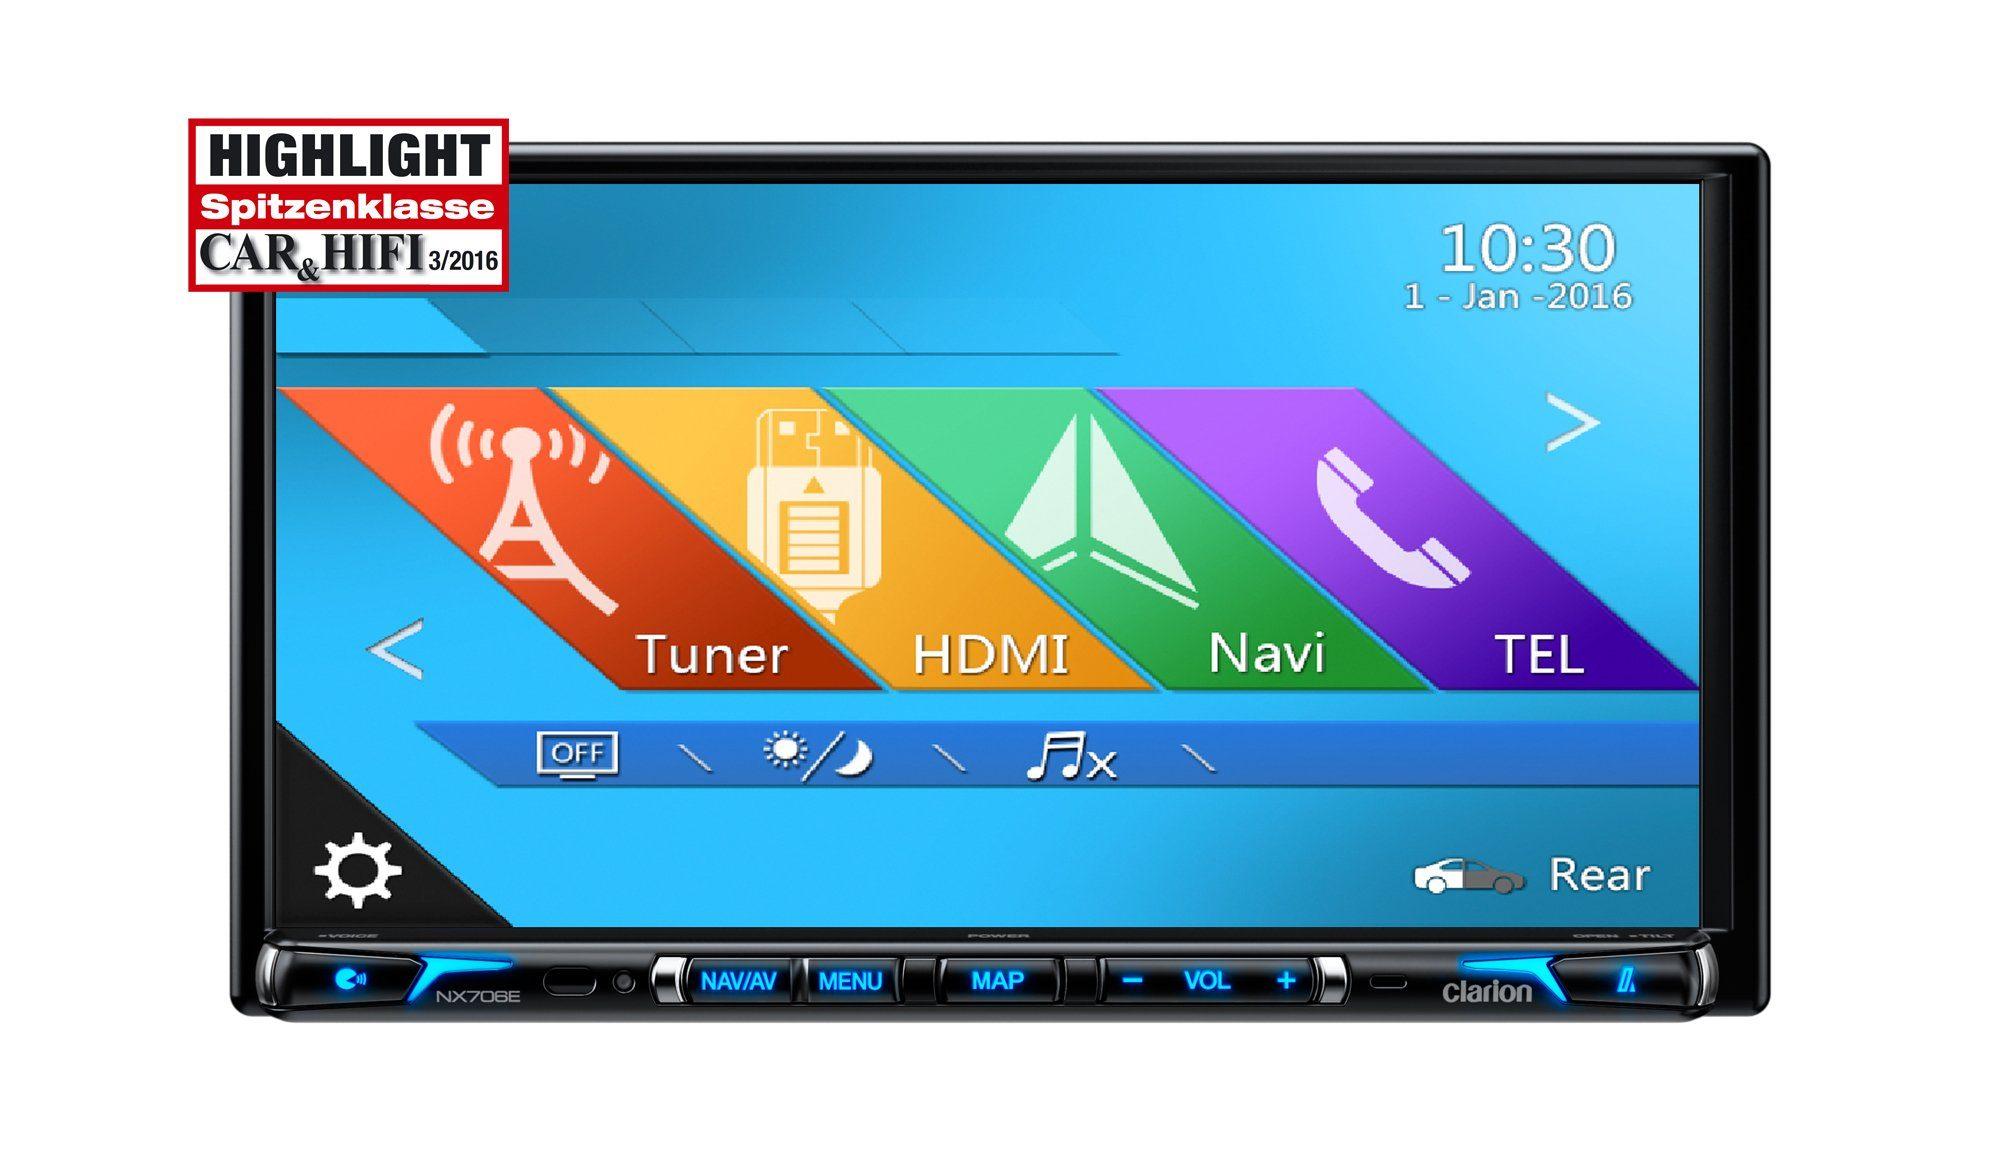 Clarion 2-DIN Multimedia Steuergerät »NX706EDAB«